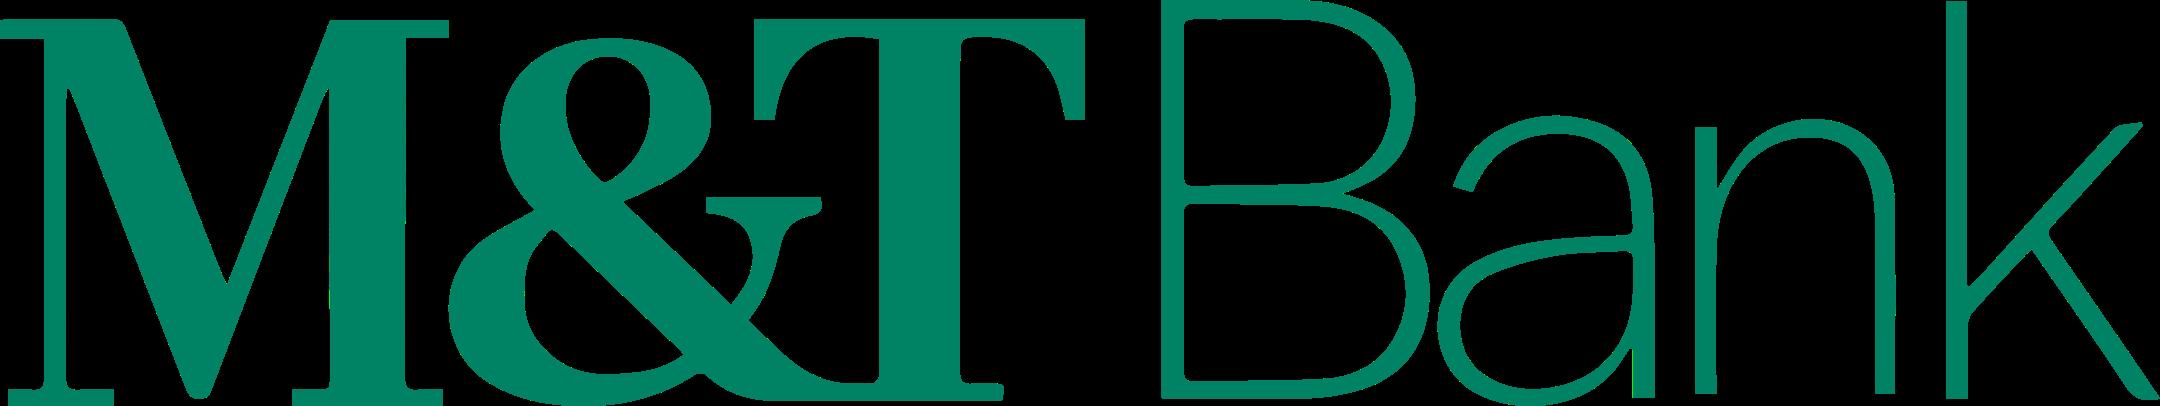 mt bank logo 1 - M&T Bank Logo